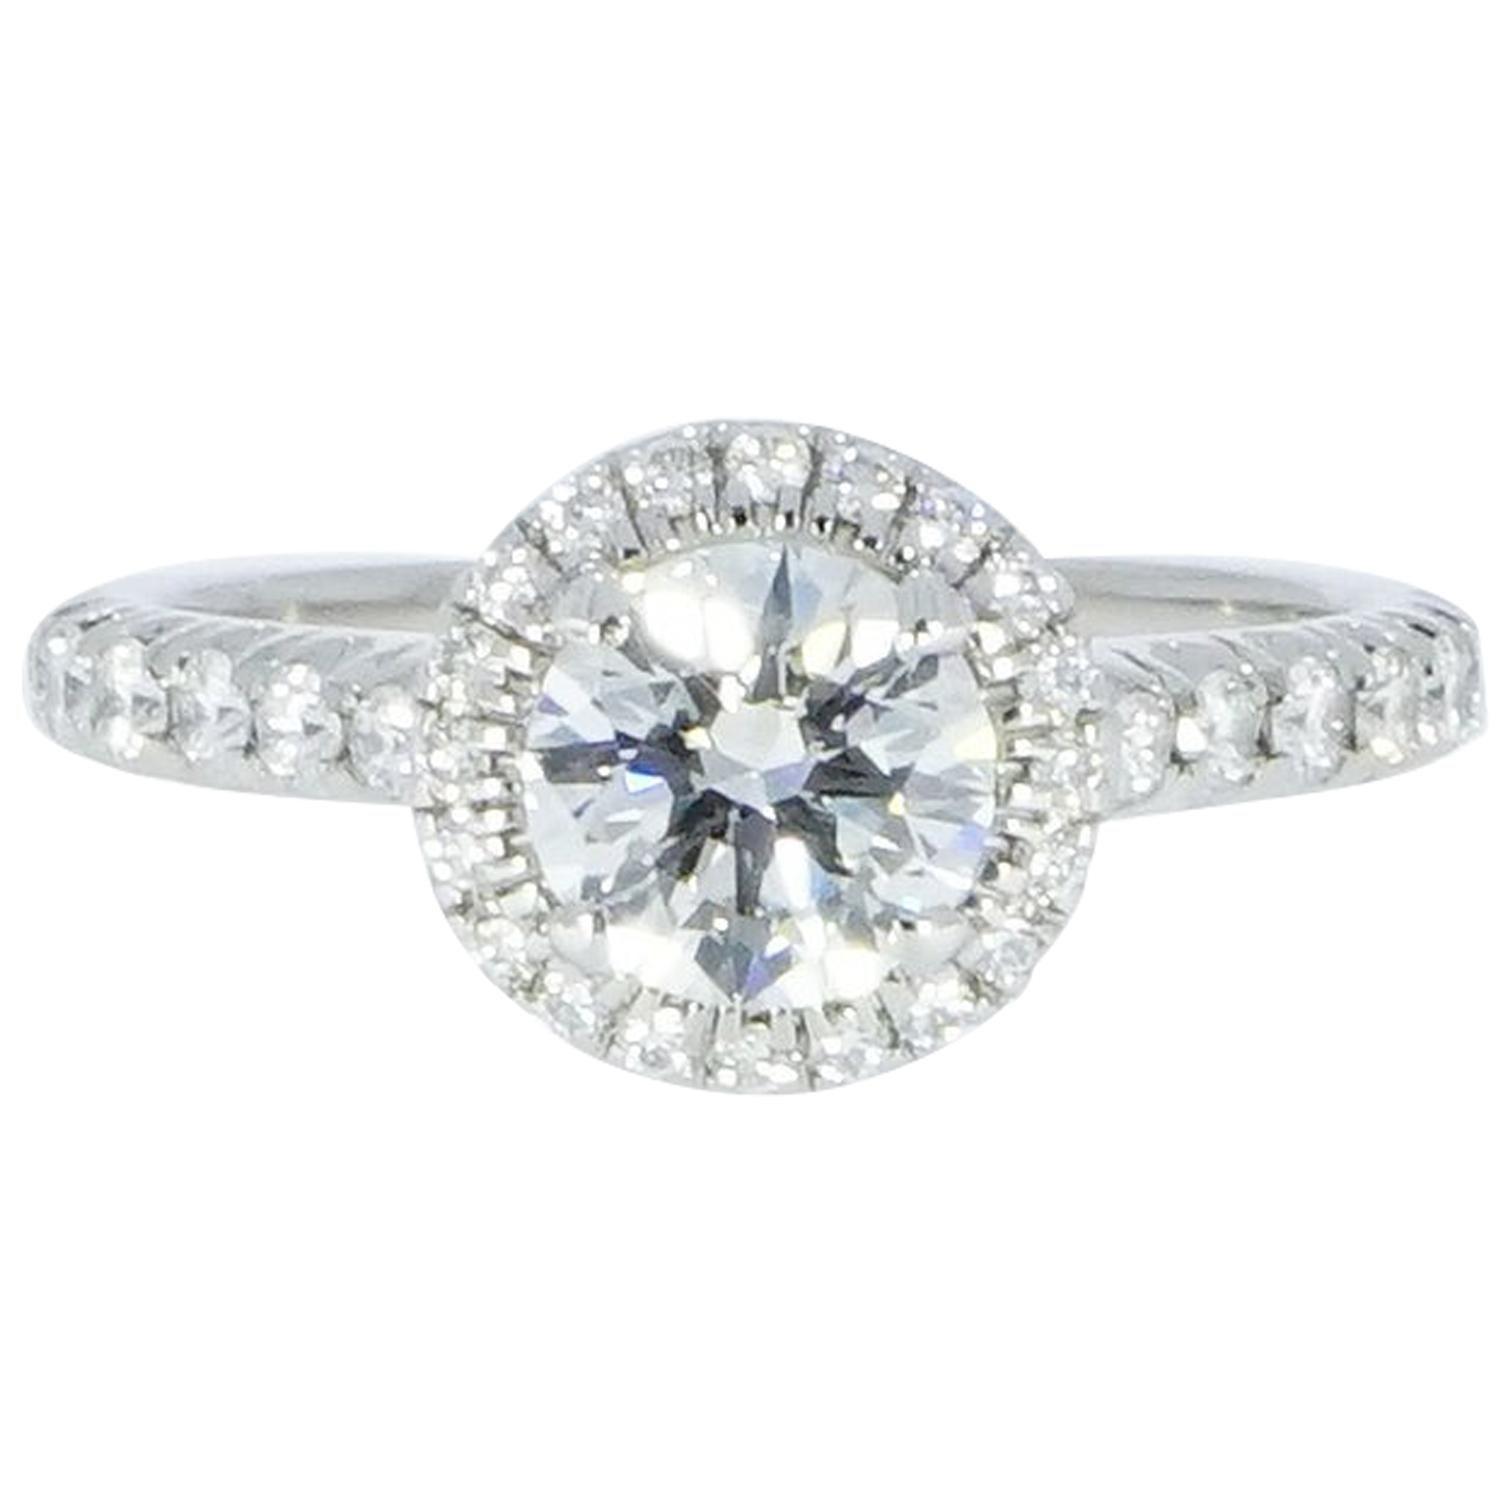 Cartier Round Diamond Halo Platinum Engagement Ring